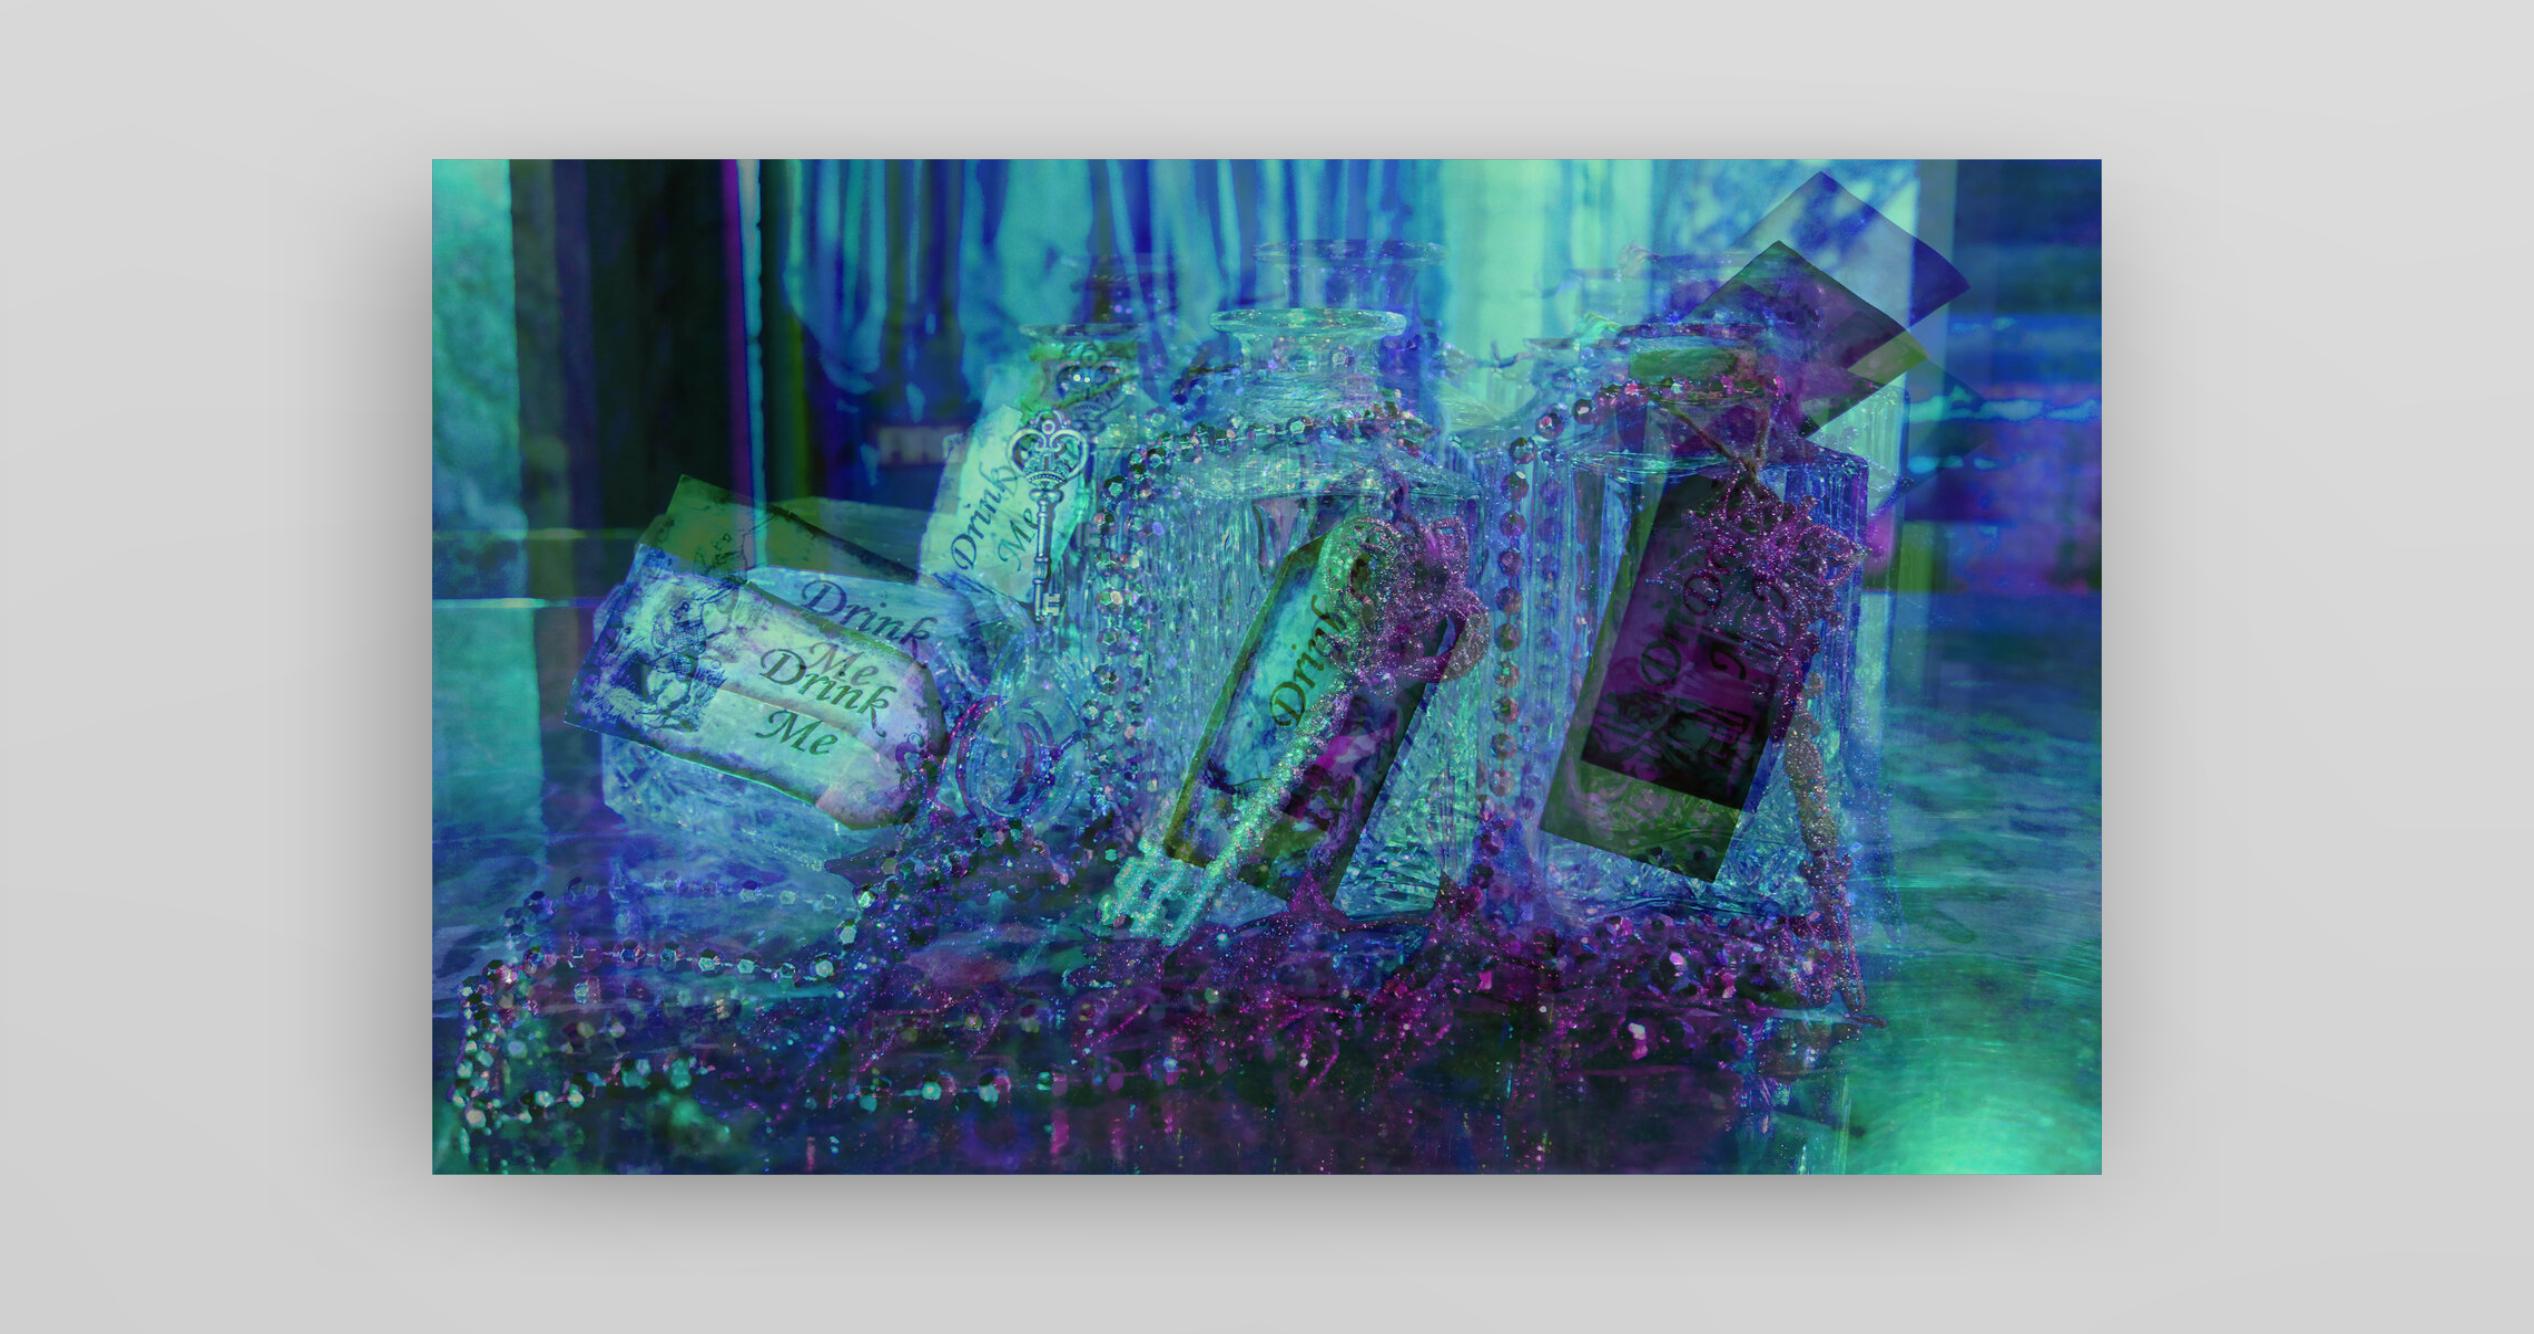 Alice in Wonderland inspired artwork by Dani Hiatt, a student specialising in photography